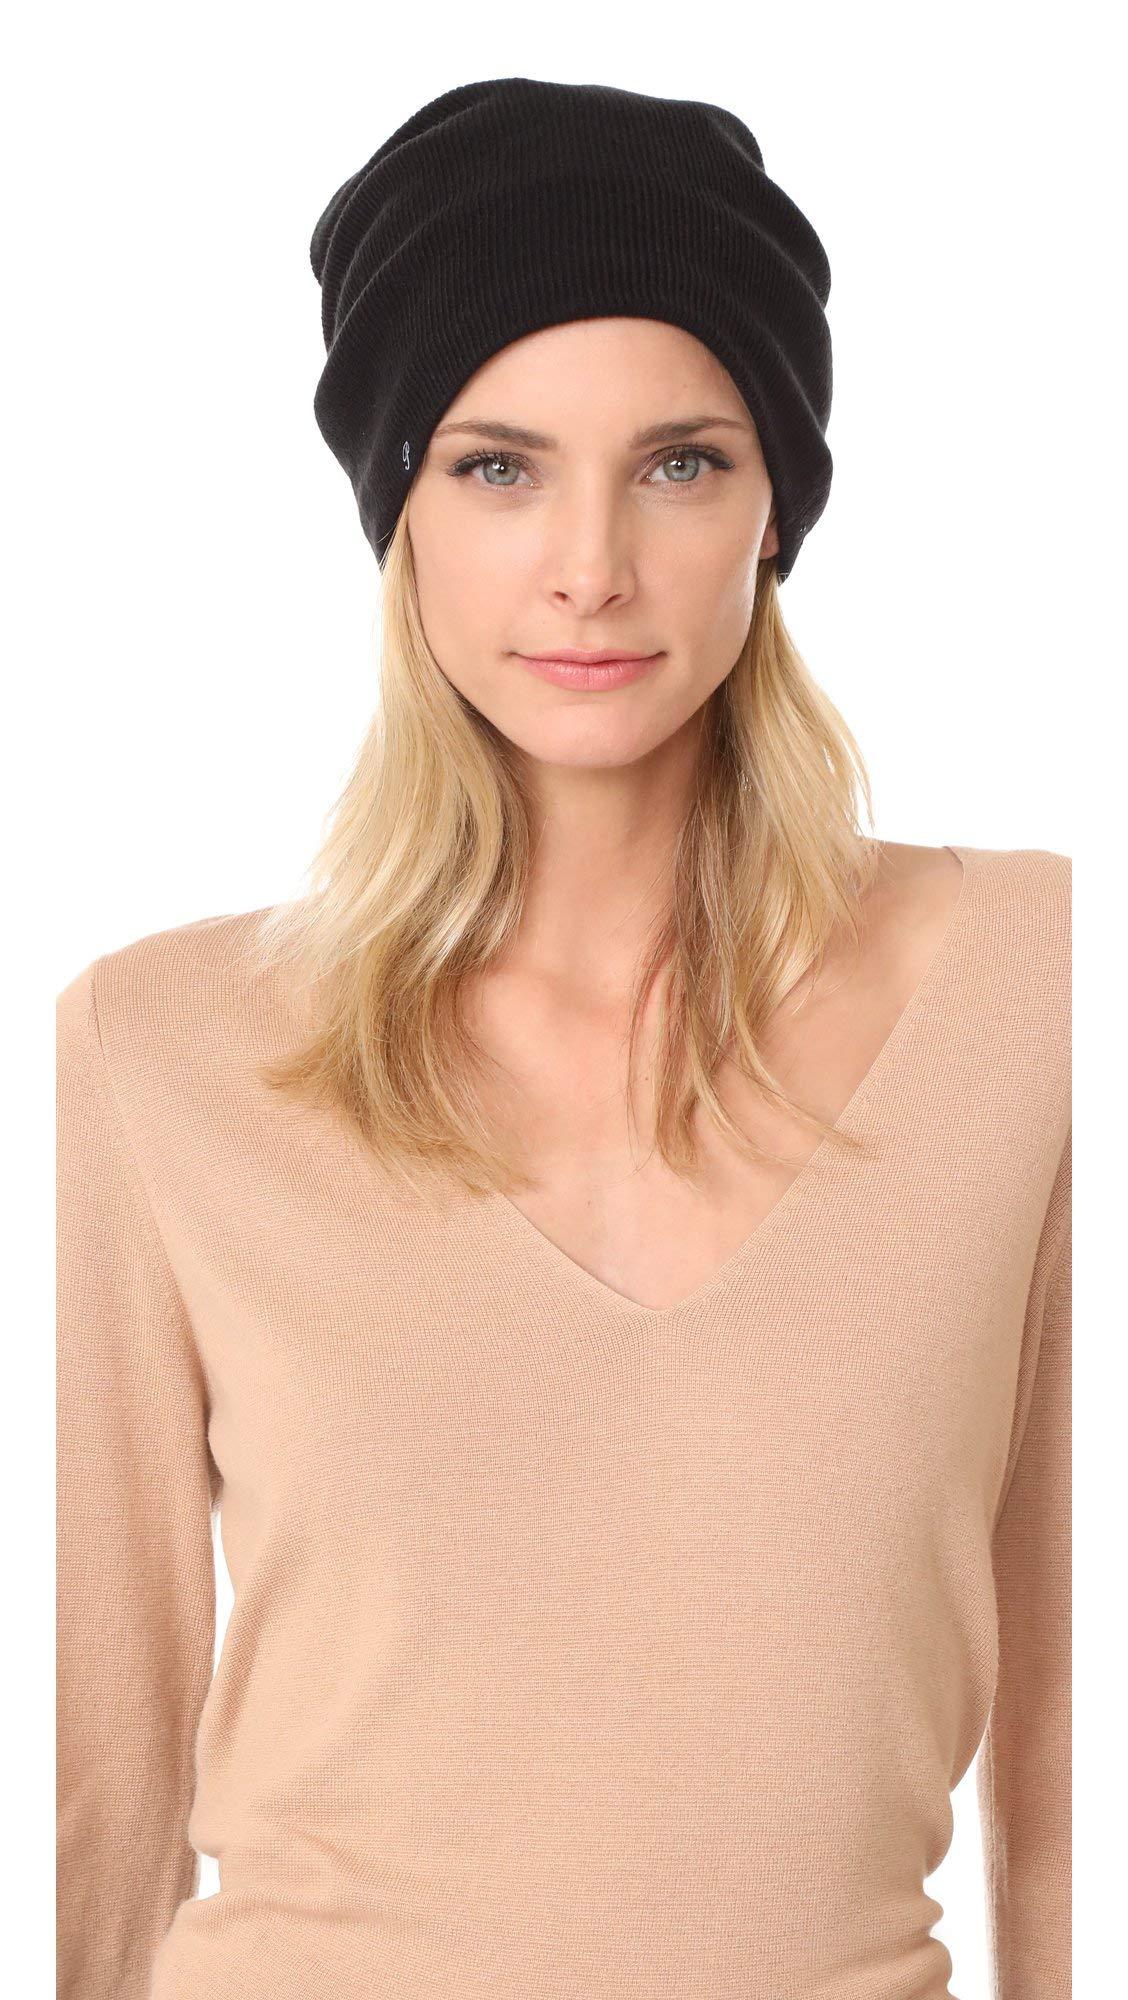 Plush Barca Slouchy Fit Fleece Lined Beanie Hat (Black)